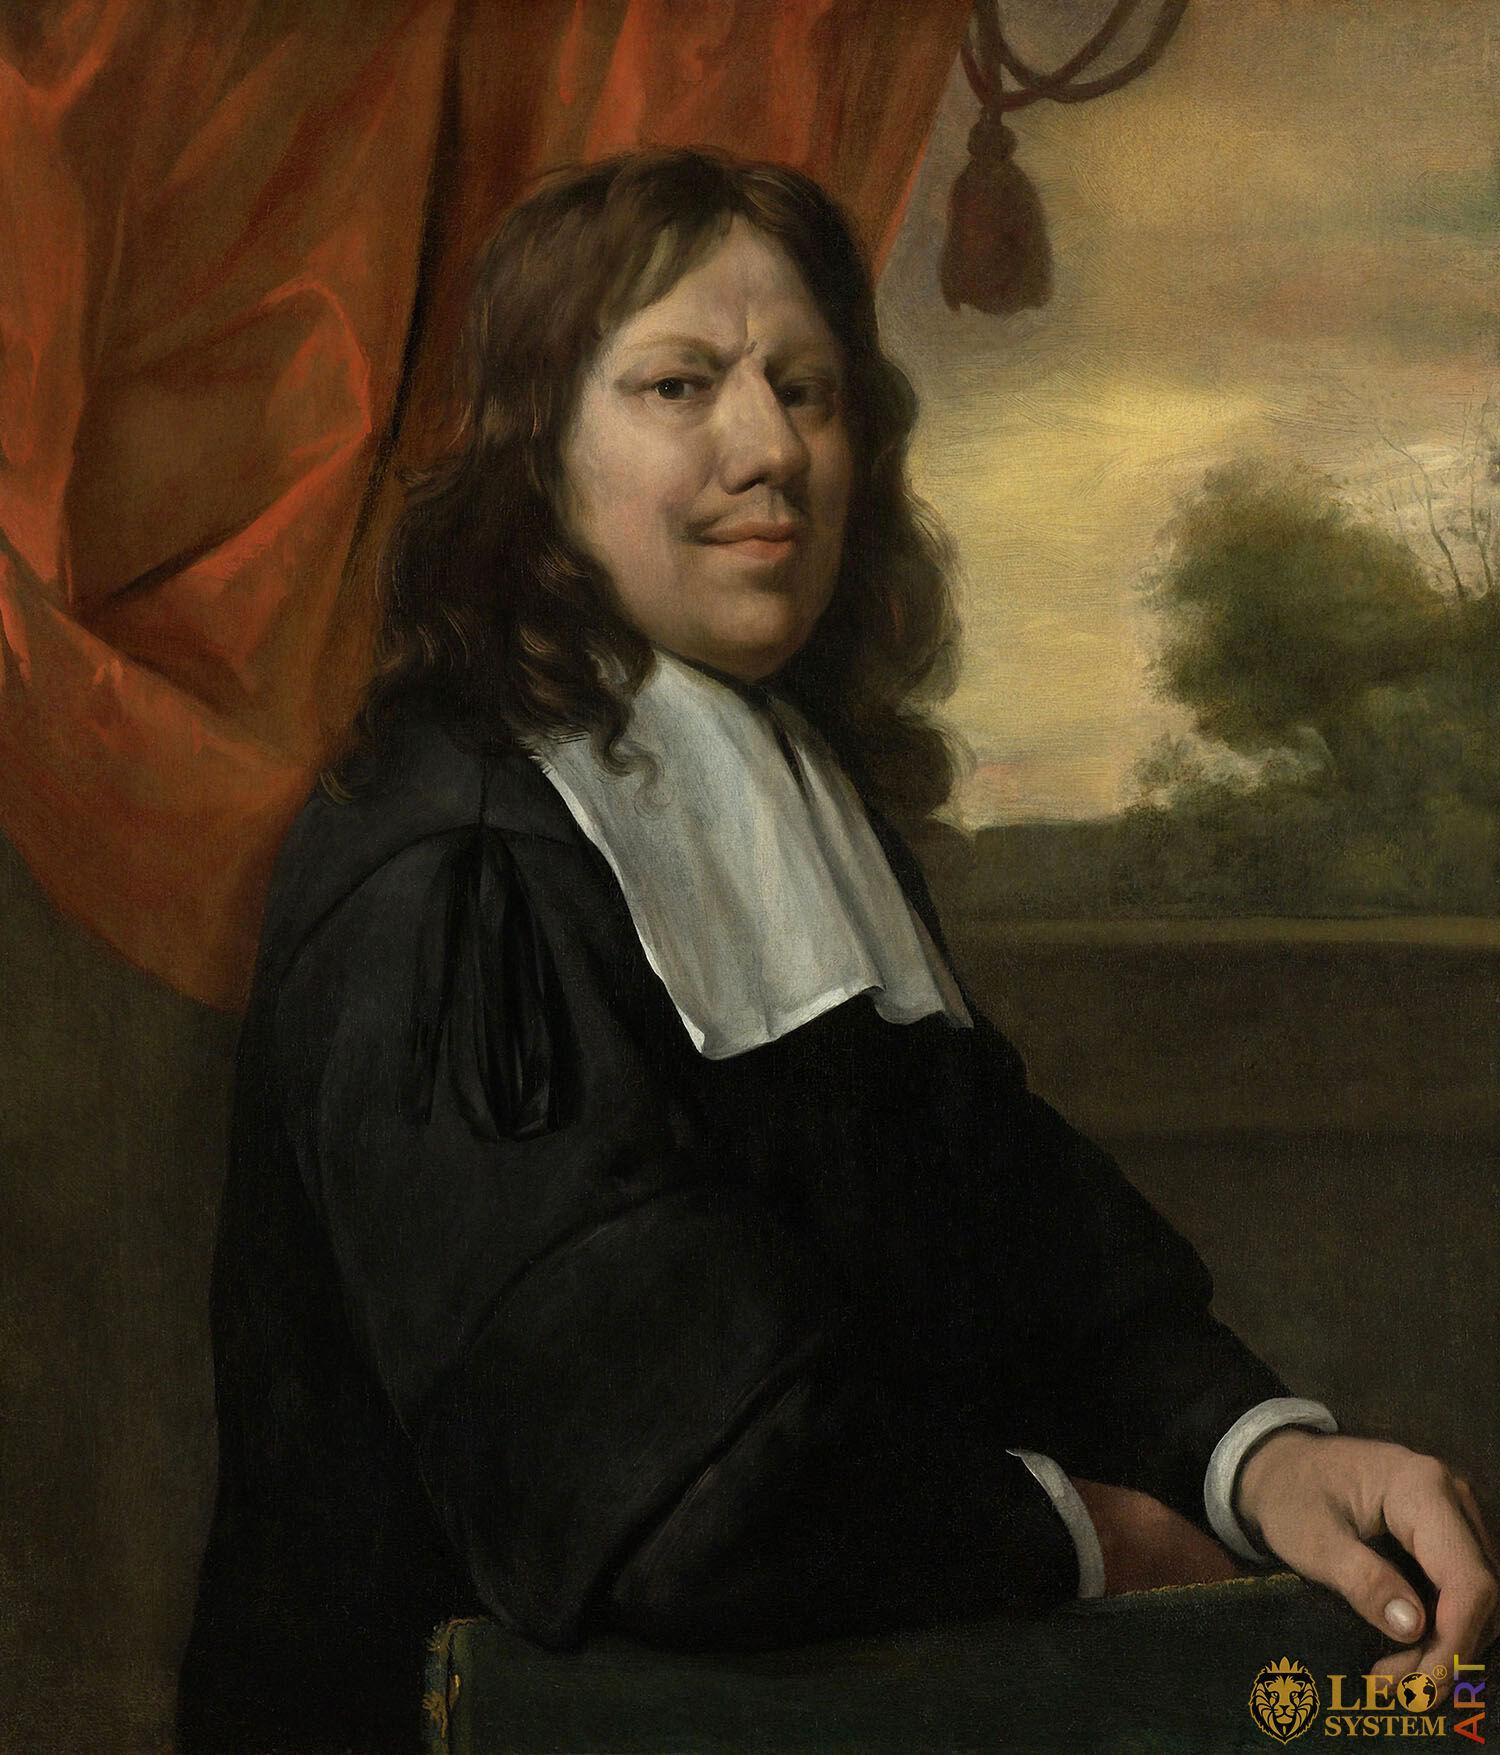 Self-Portrait, Jan Steen, Painter: Jan Havickszoon Steen, 1670, Amsterdam, Netherlands, Original painting